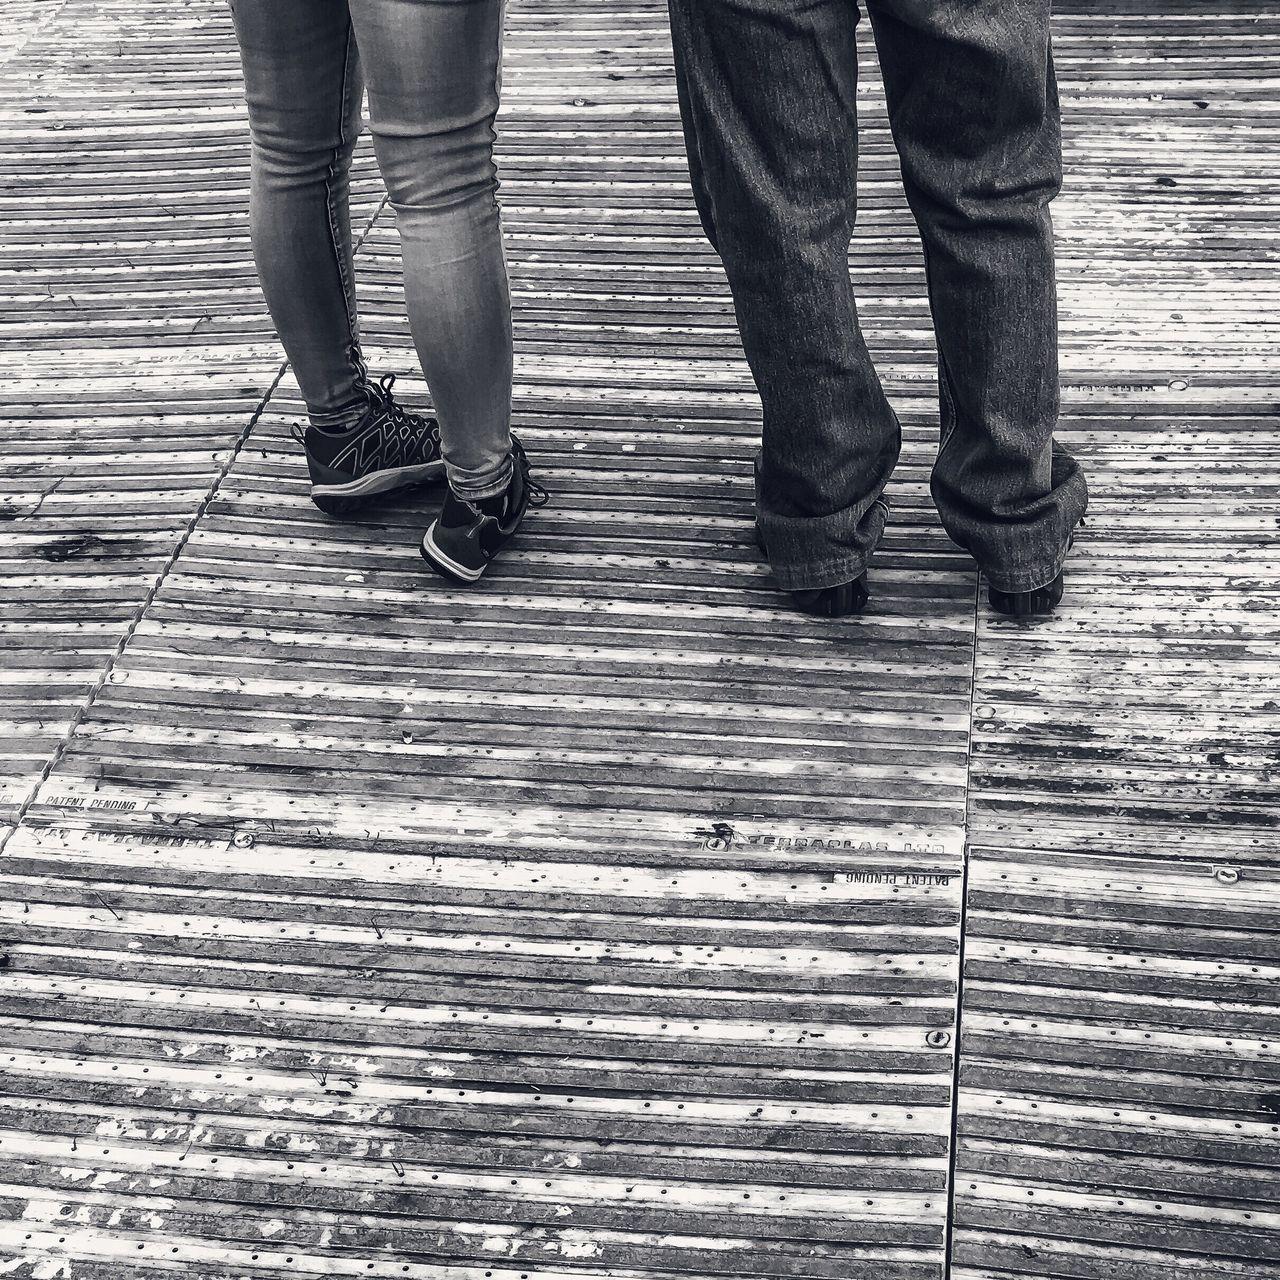 low section, person, lifestyles, shoe, men, standing, leisure activity, human foot, walking, jeans, street, cobblestone, footwear, casual clothing, sidewalk